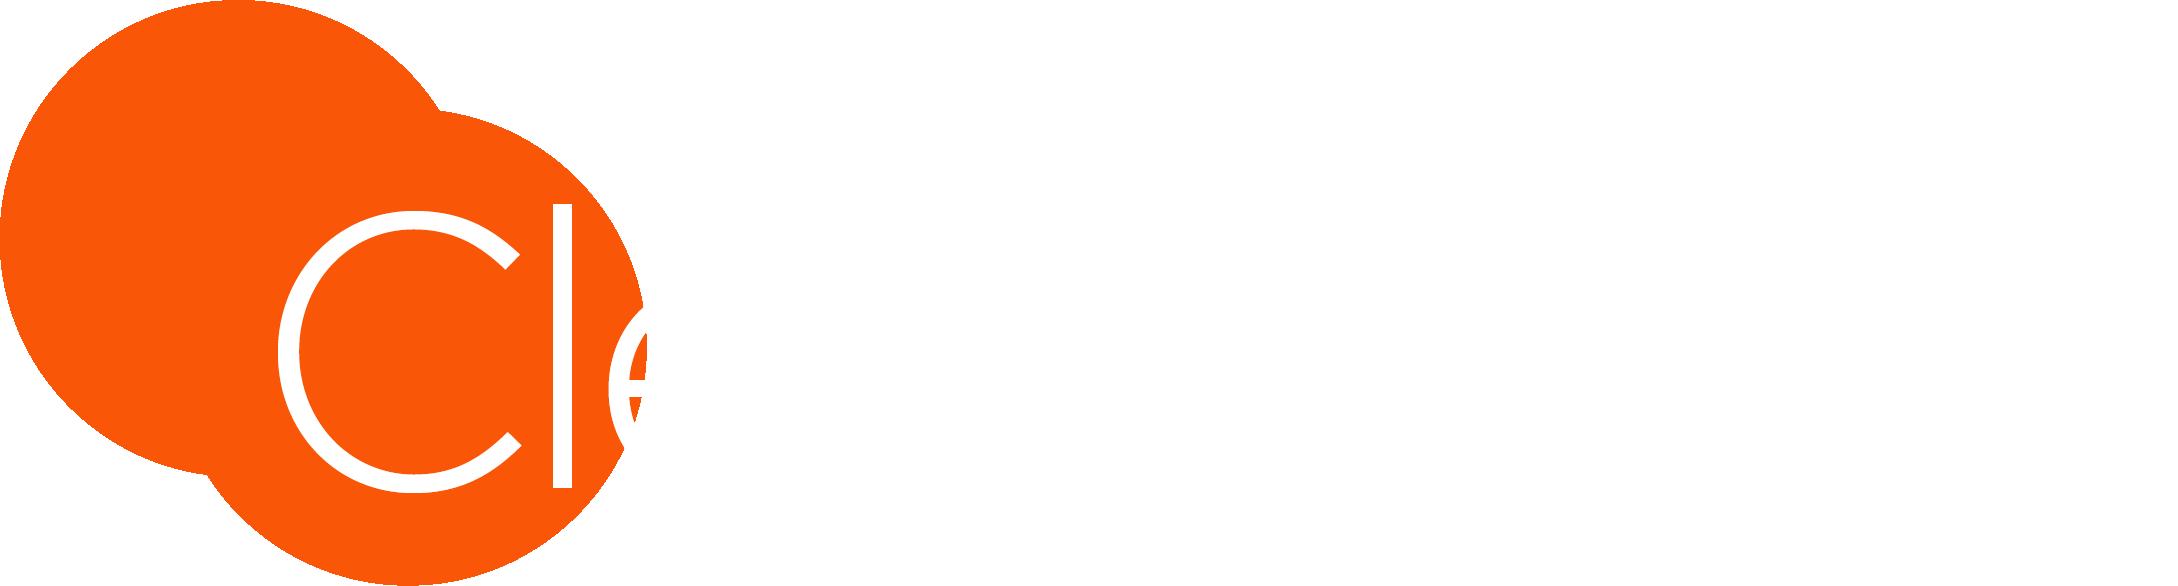 ClearSight Logo White - Orange